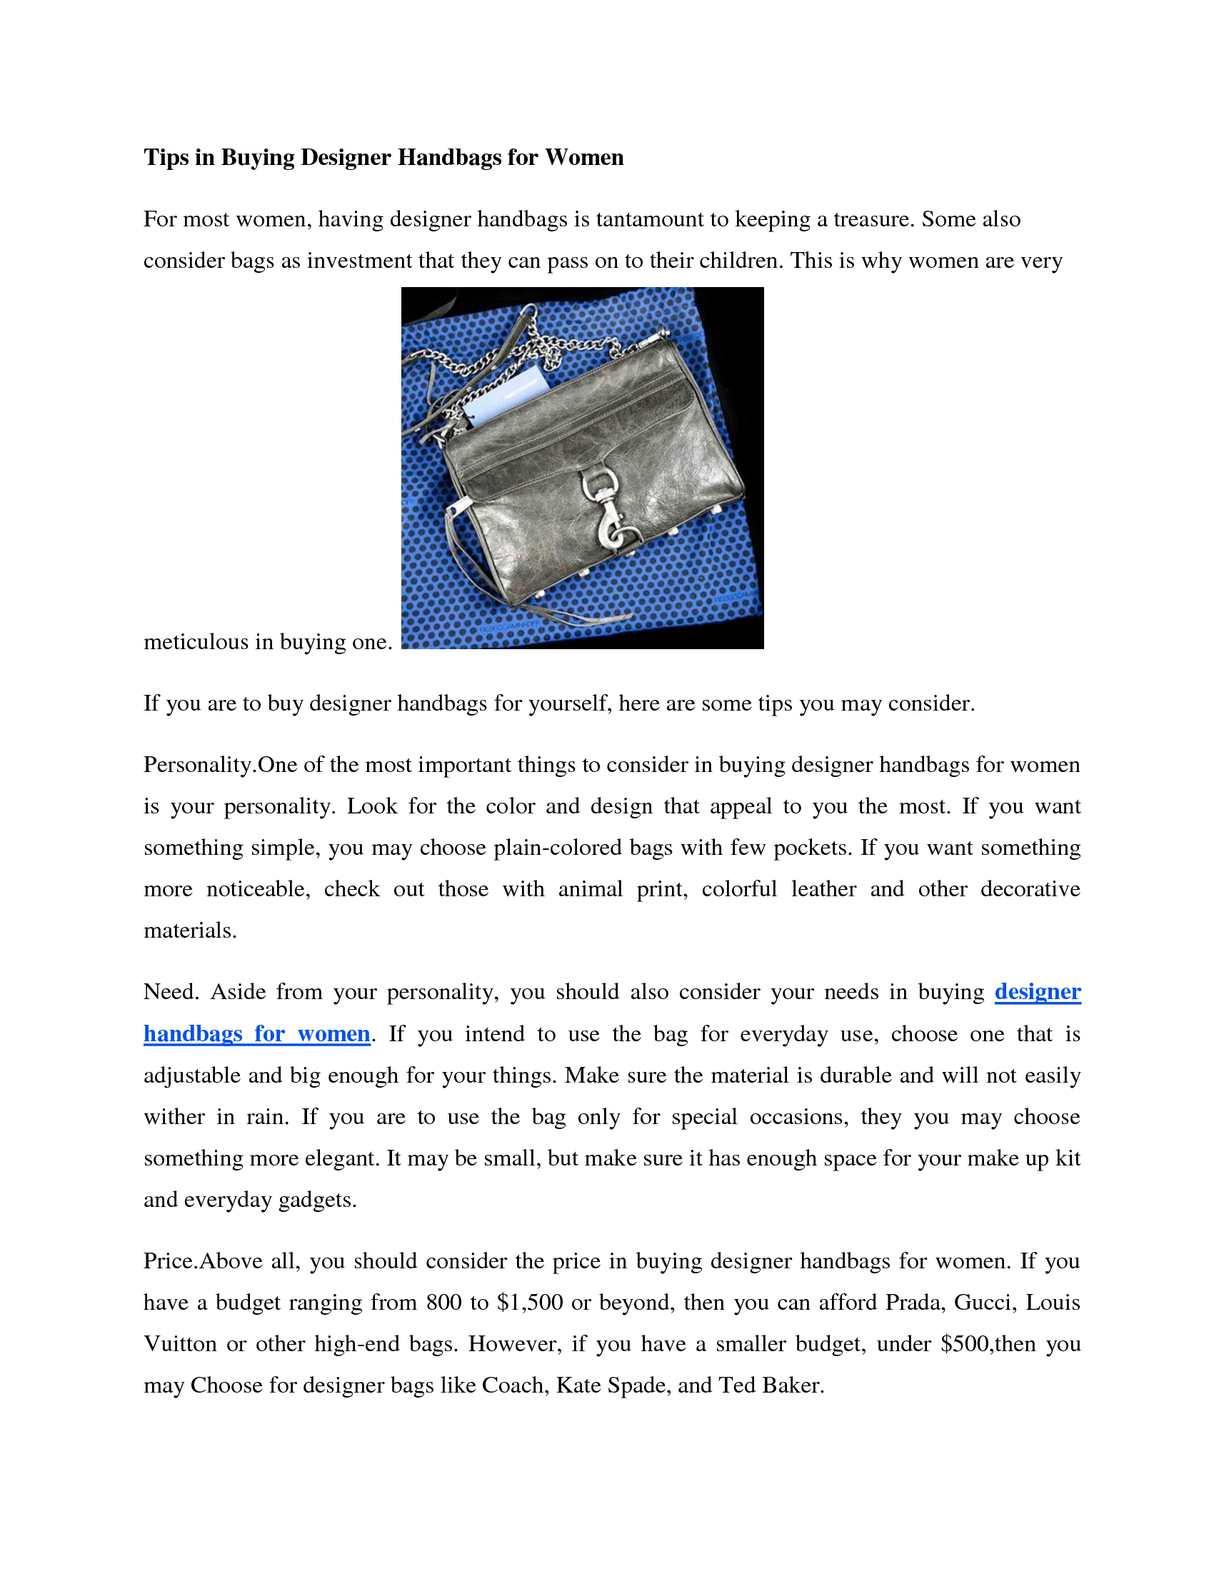 df89d671a8 Calaméo - Tips in Buying Designer Handbags for Women